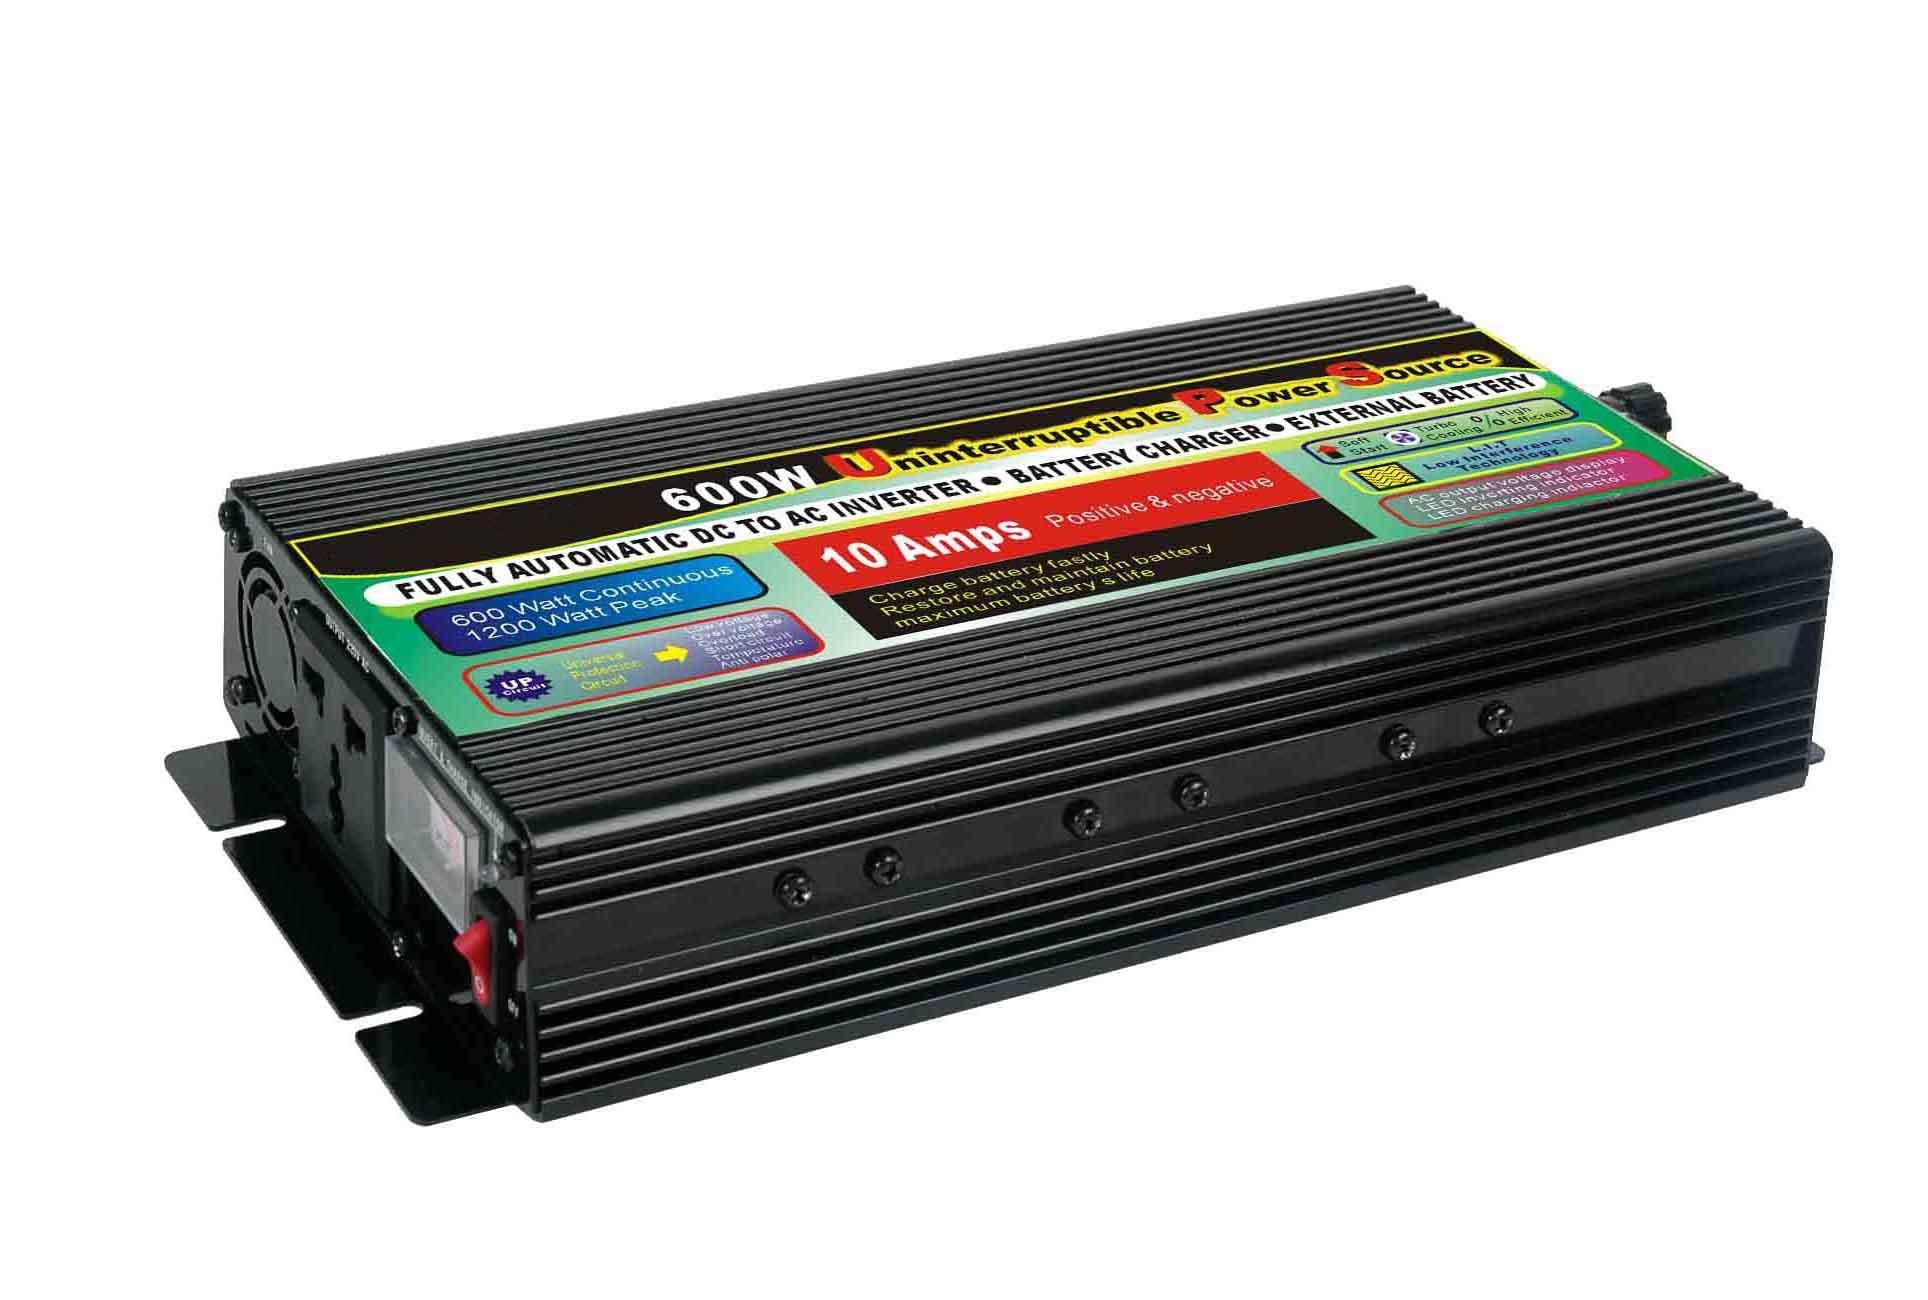 Power Inverter - InverterCharger FAQ Tripp Lite